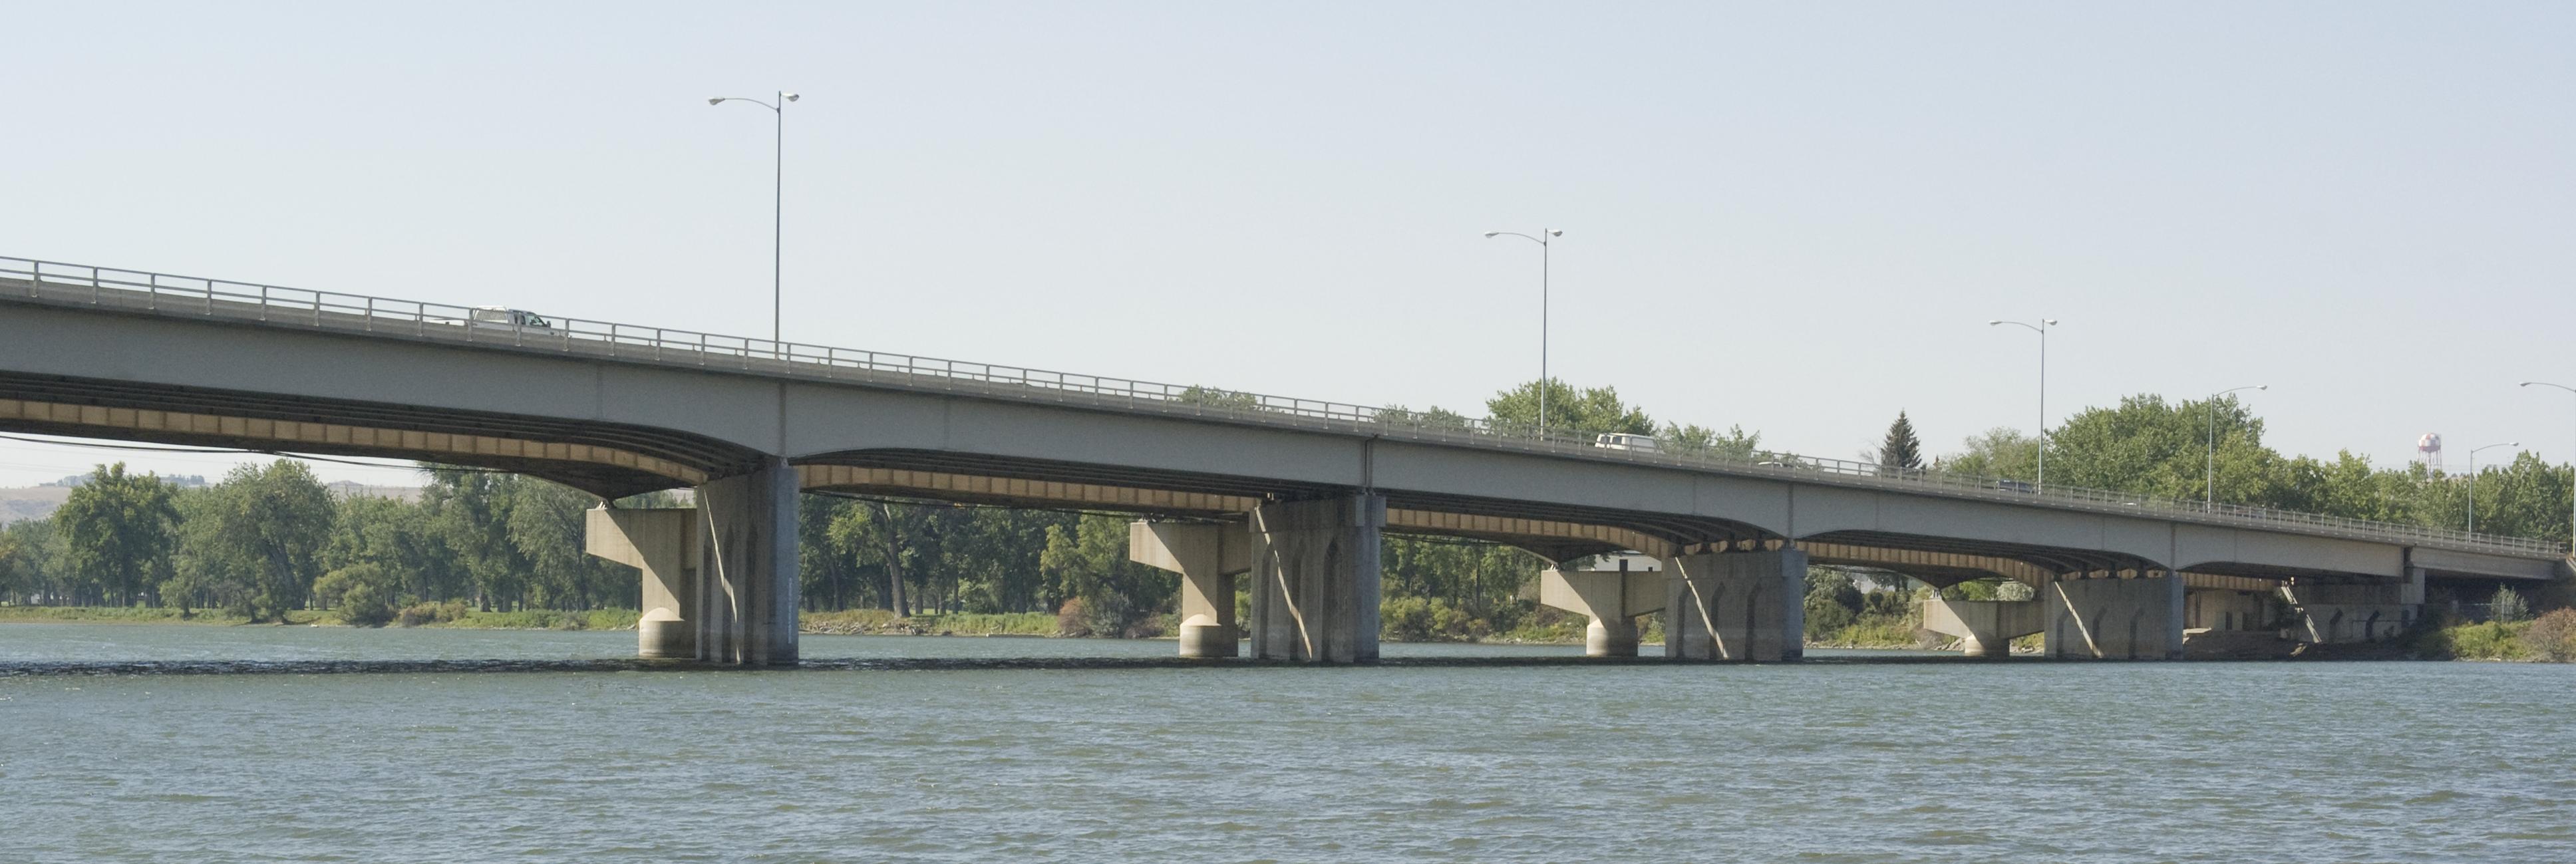 Bridge Os Version